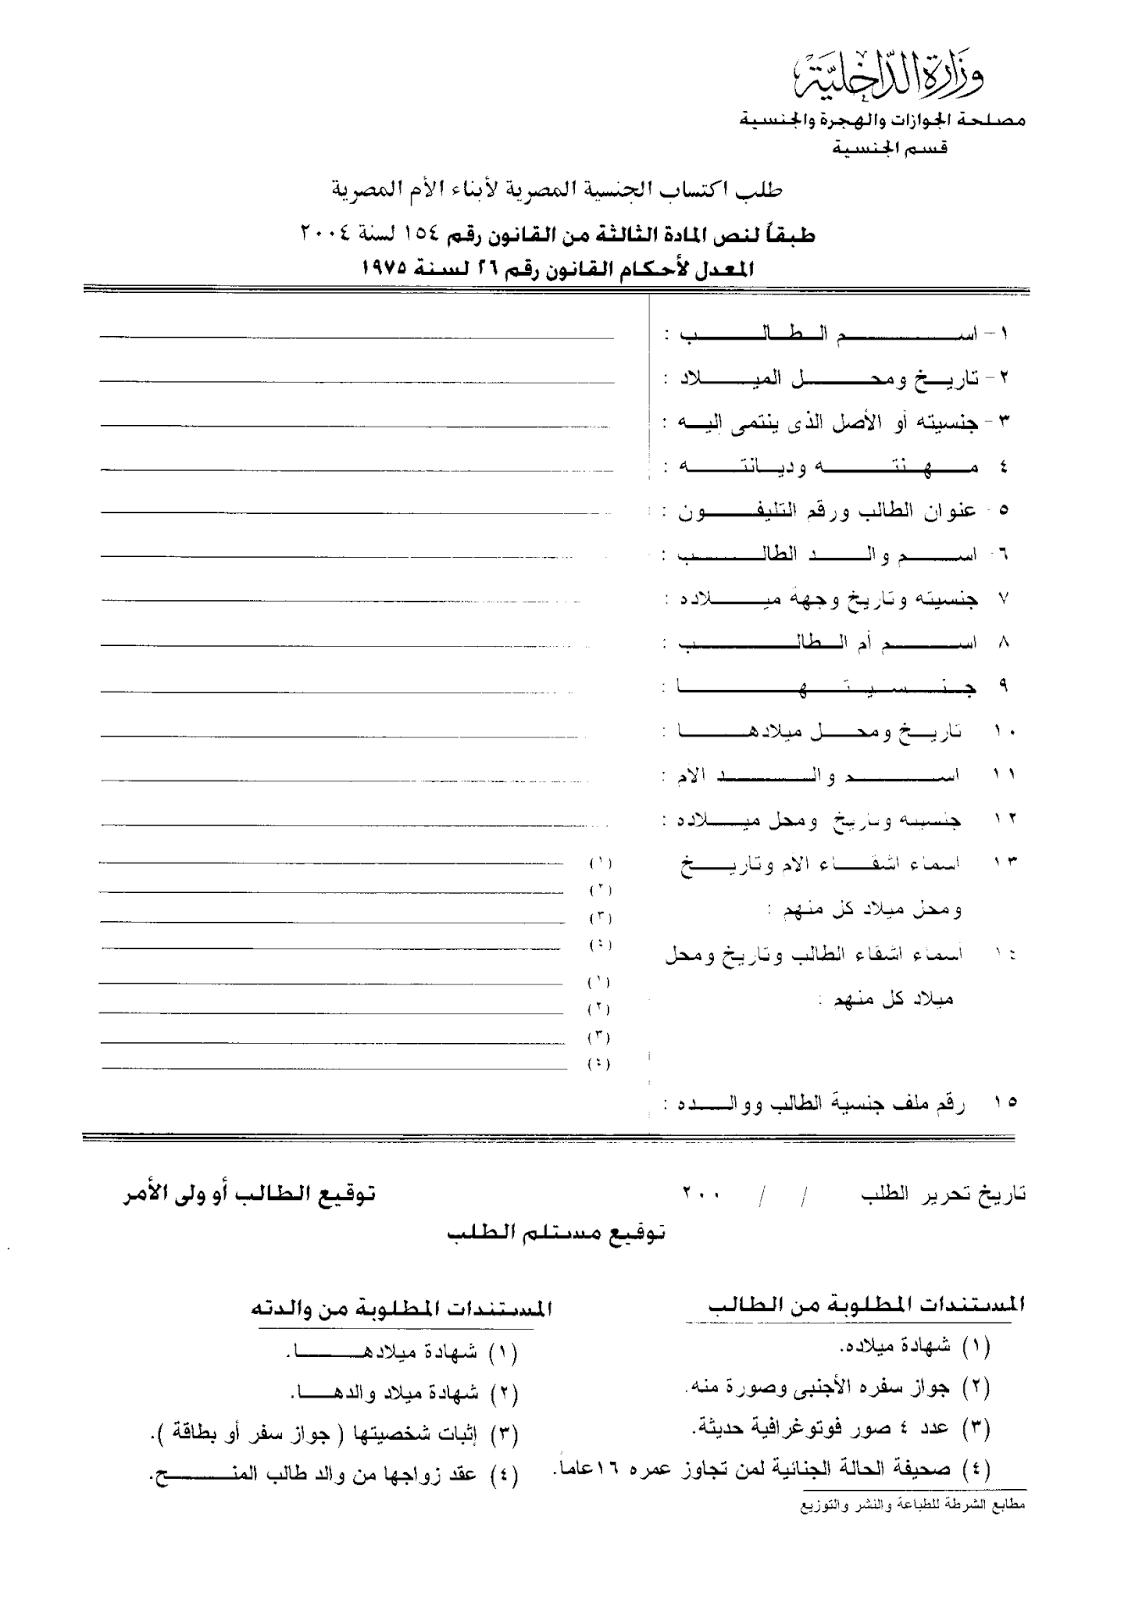 استمارة جواز سفر عراقي 2019